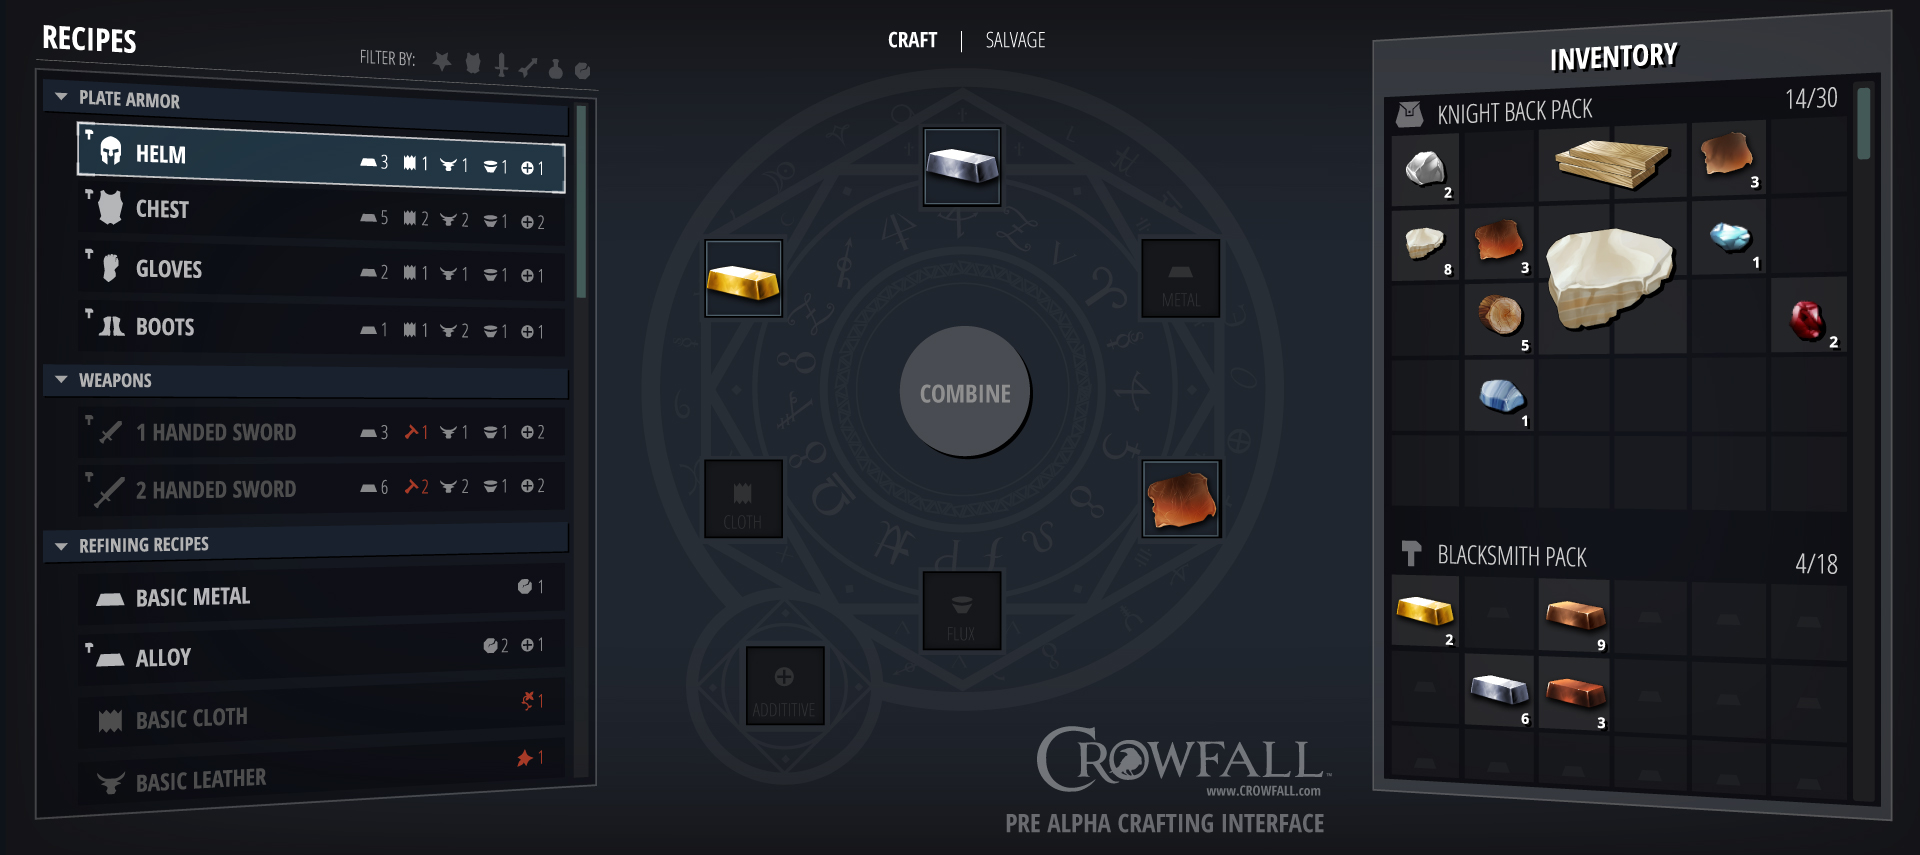 Crowfall_PreAlphaCraftingInterface.jpg